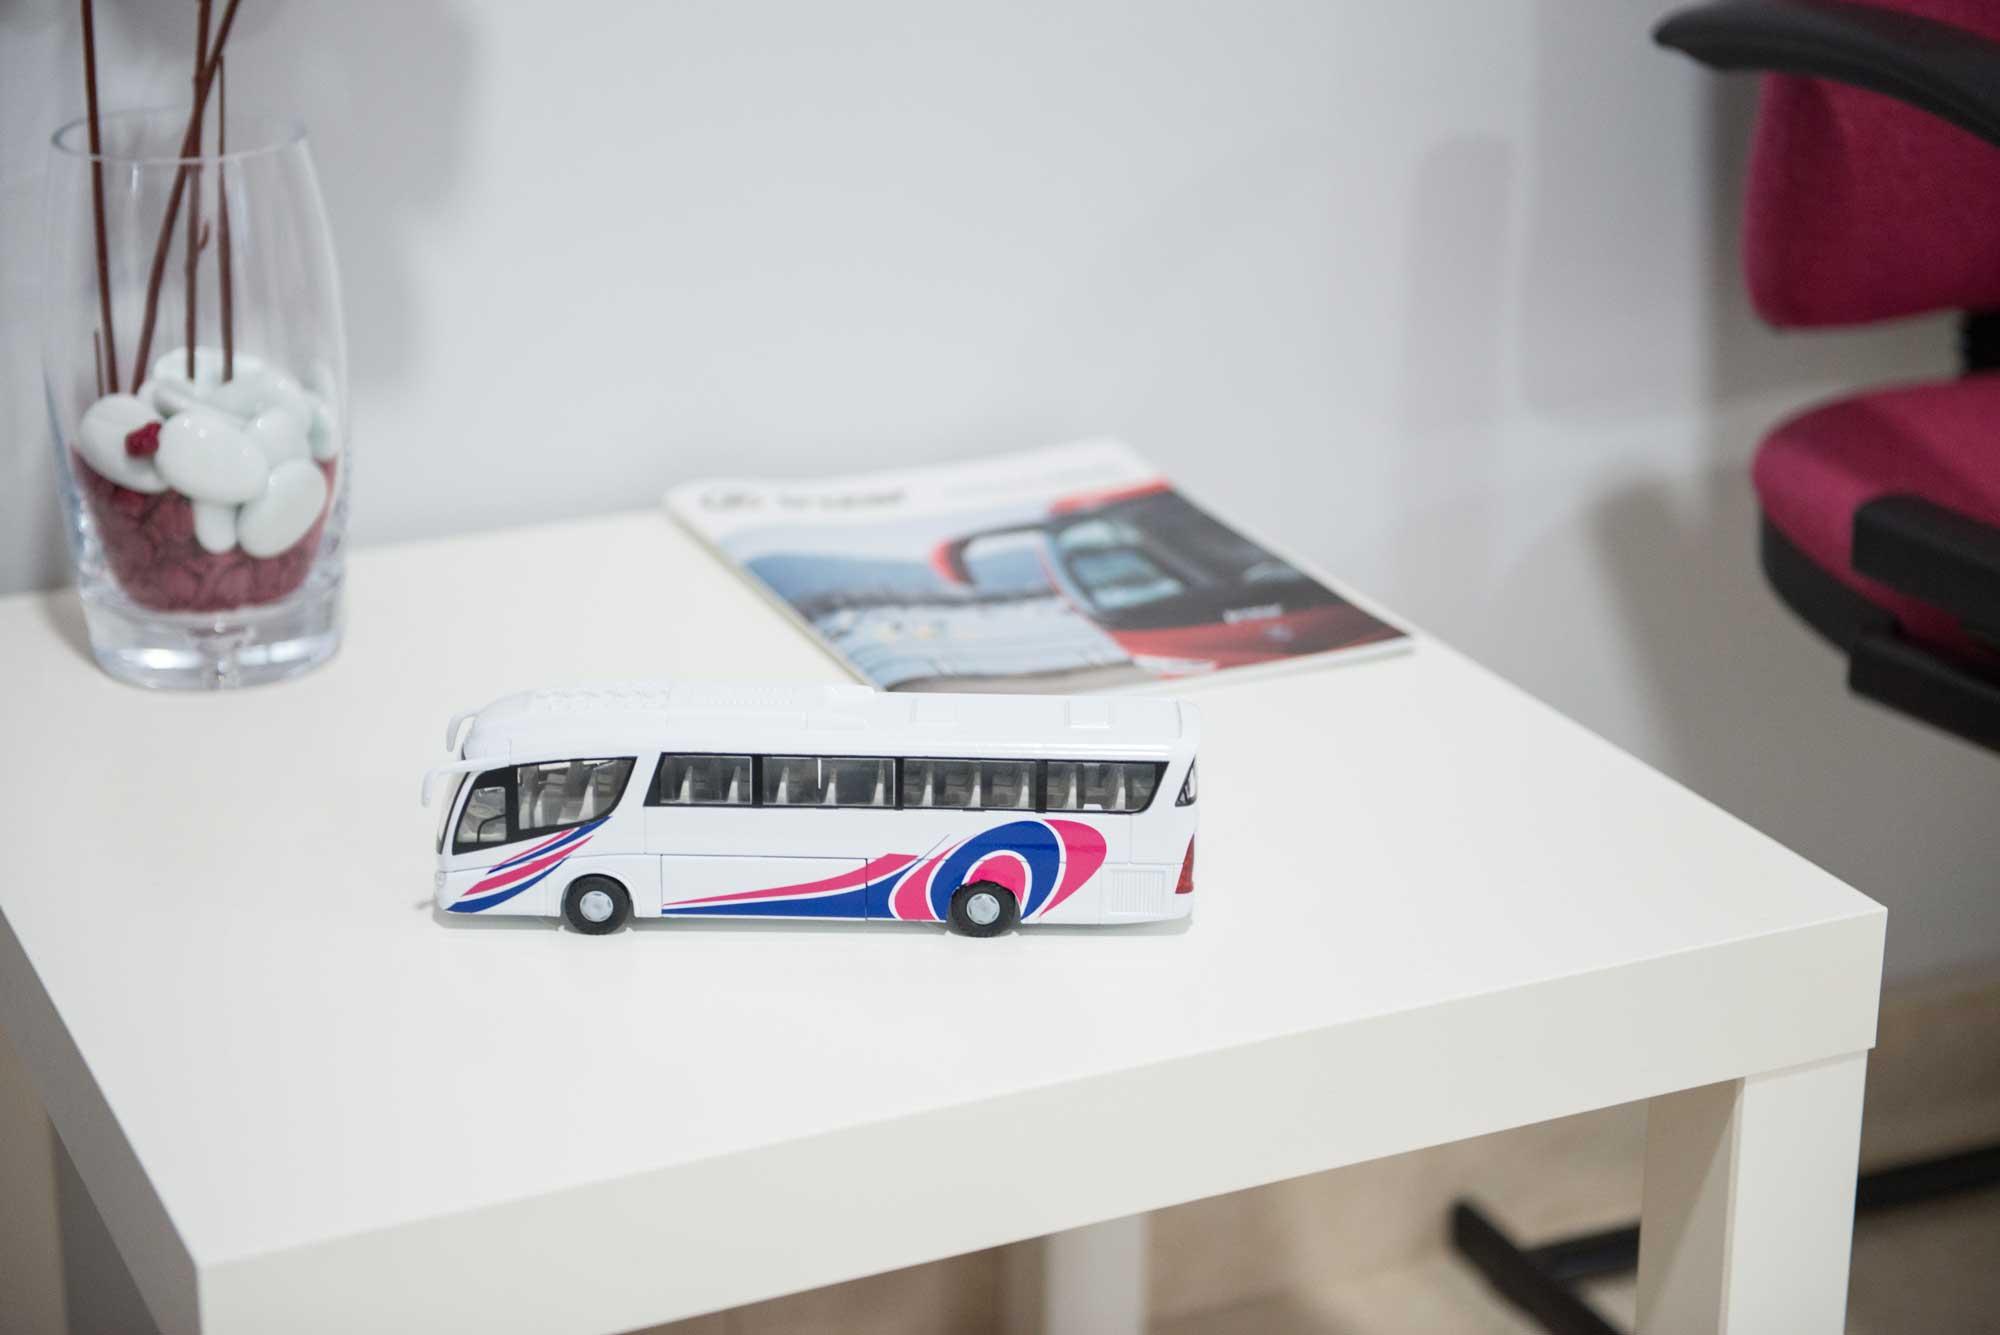 autocares-alcantara-microbuses-39-plazas-7_image